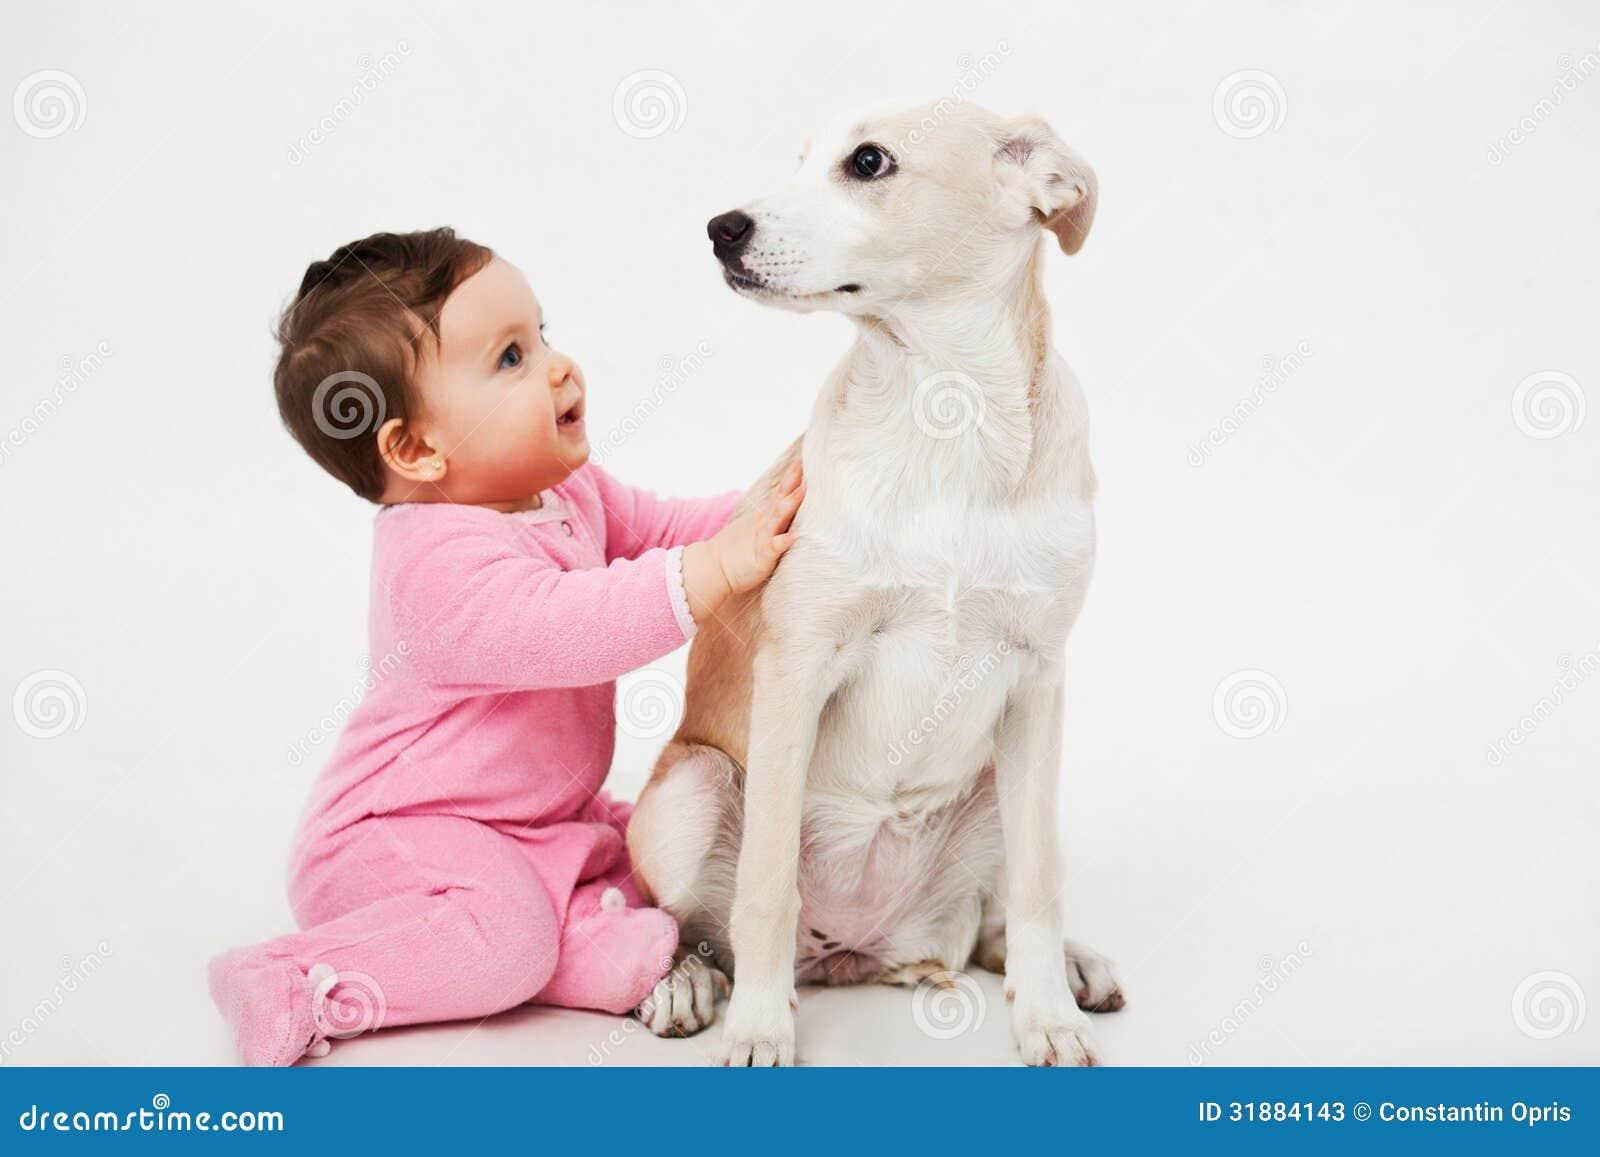 Baby And Dog Pet Stock Photos - Image: 31884143